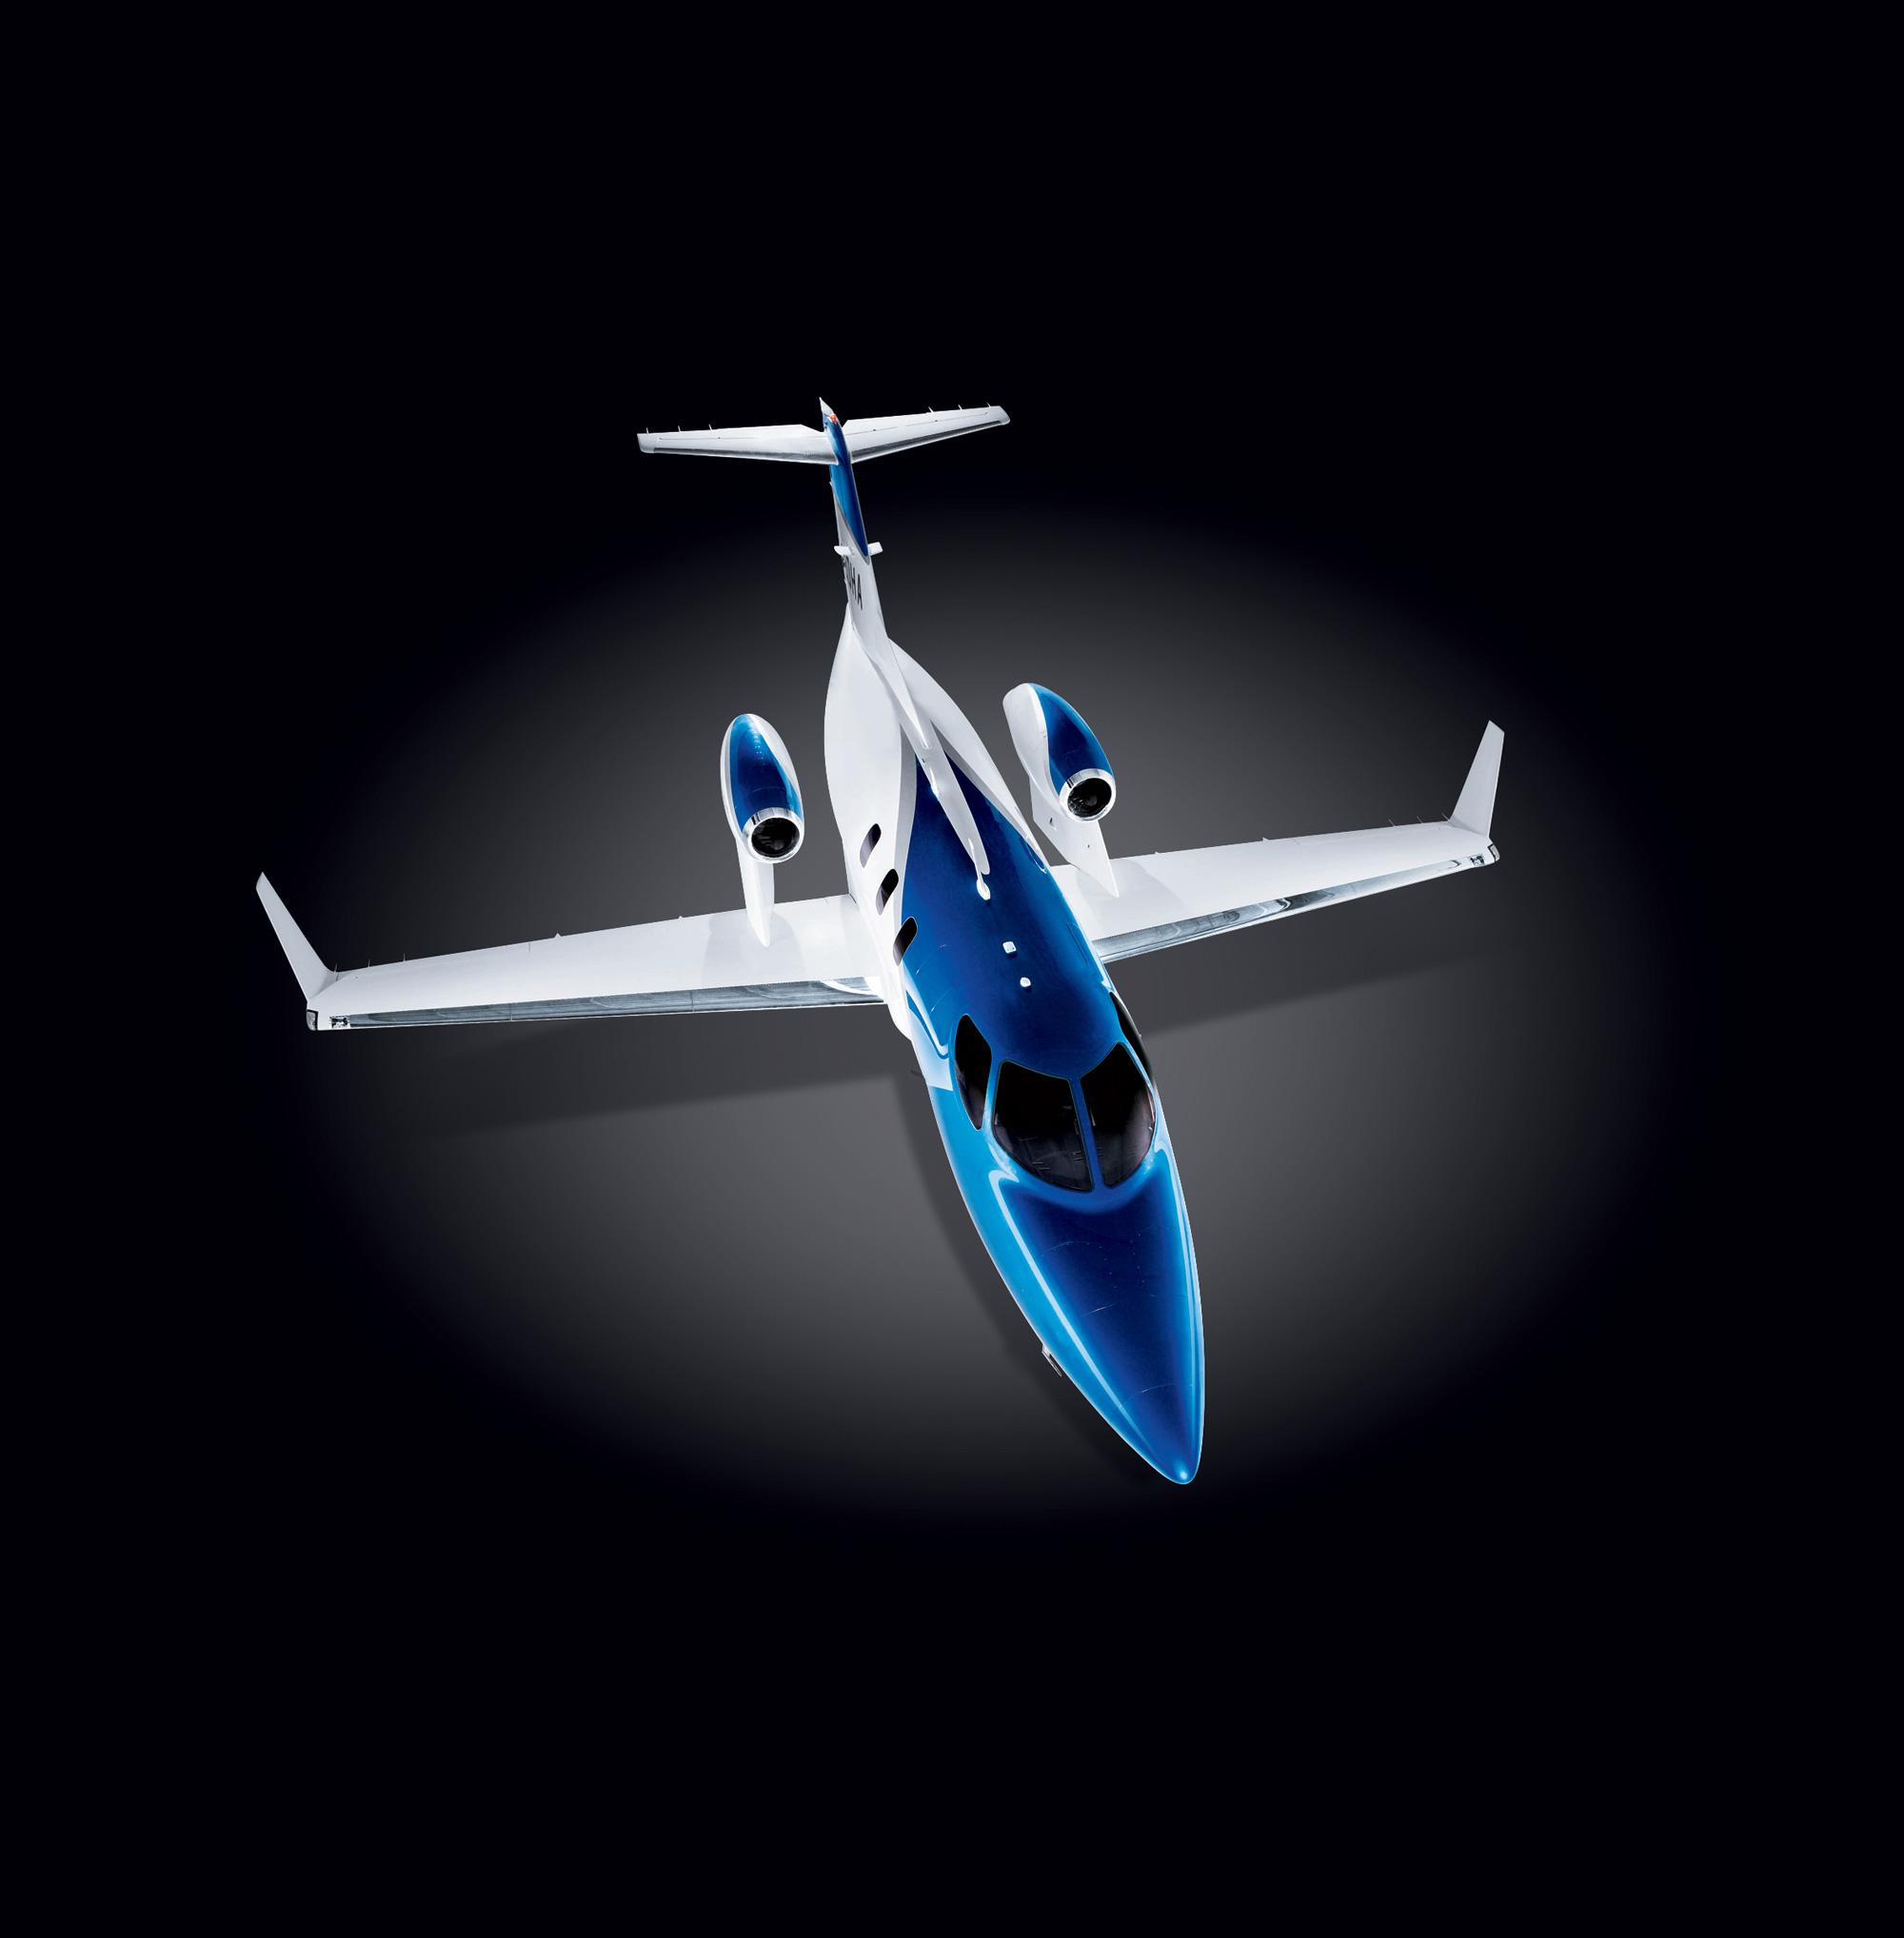 HondaJet - Honda's First Light Business Jet